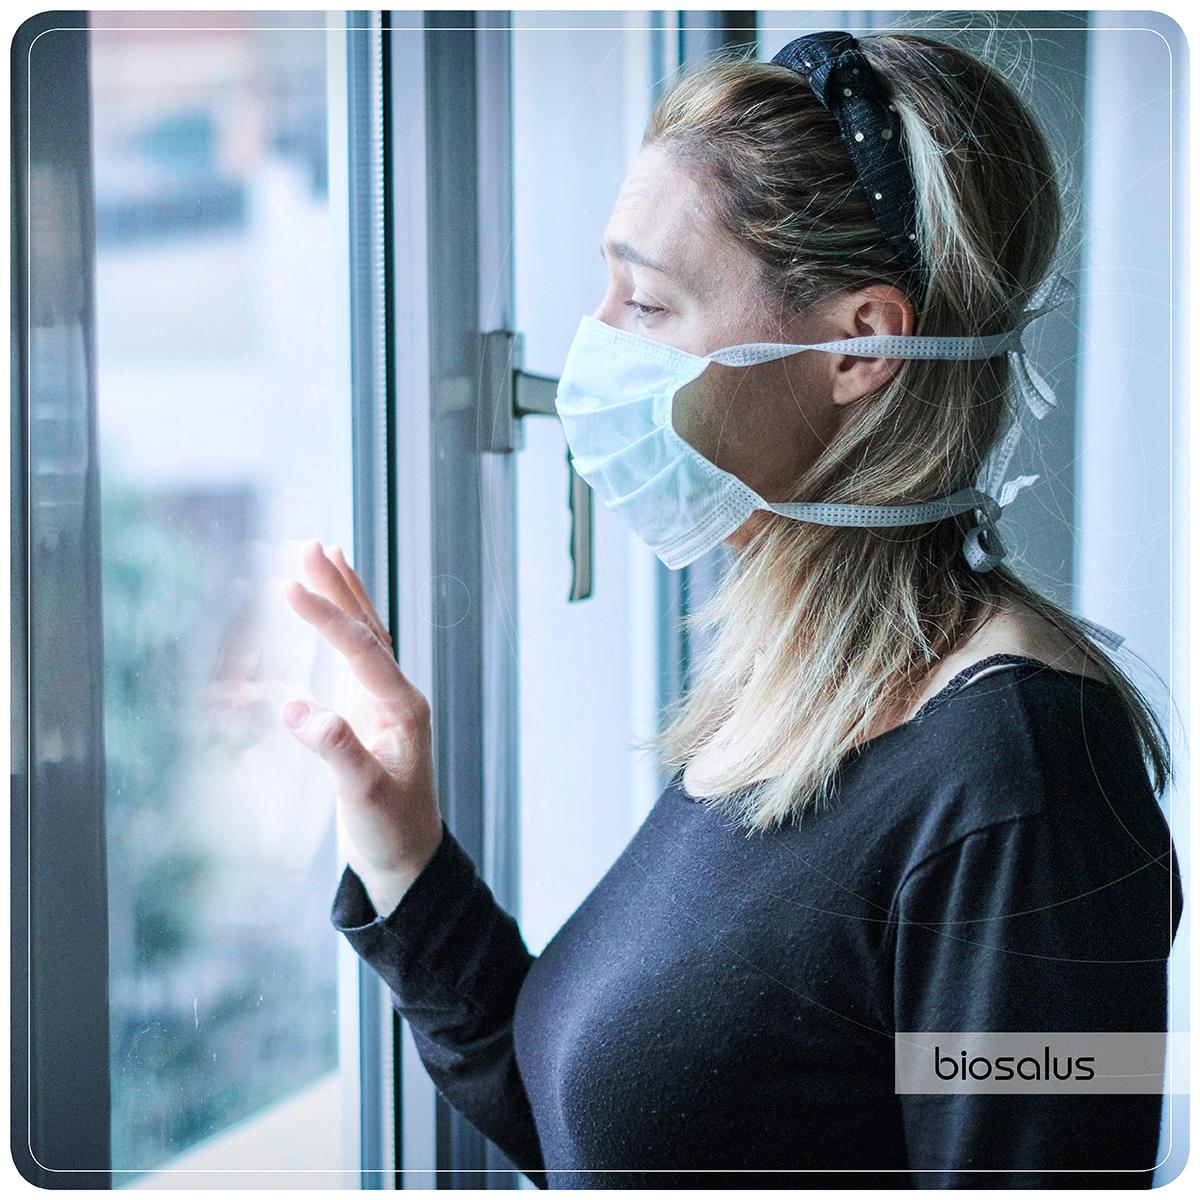 Codivd-19 durata pandemia